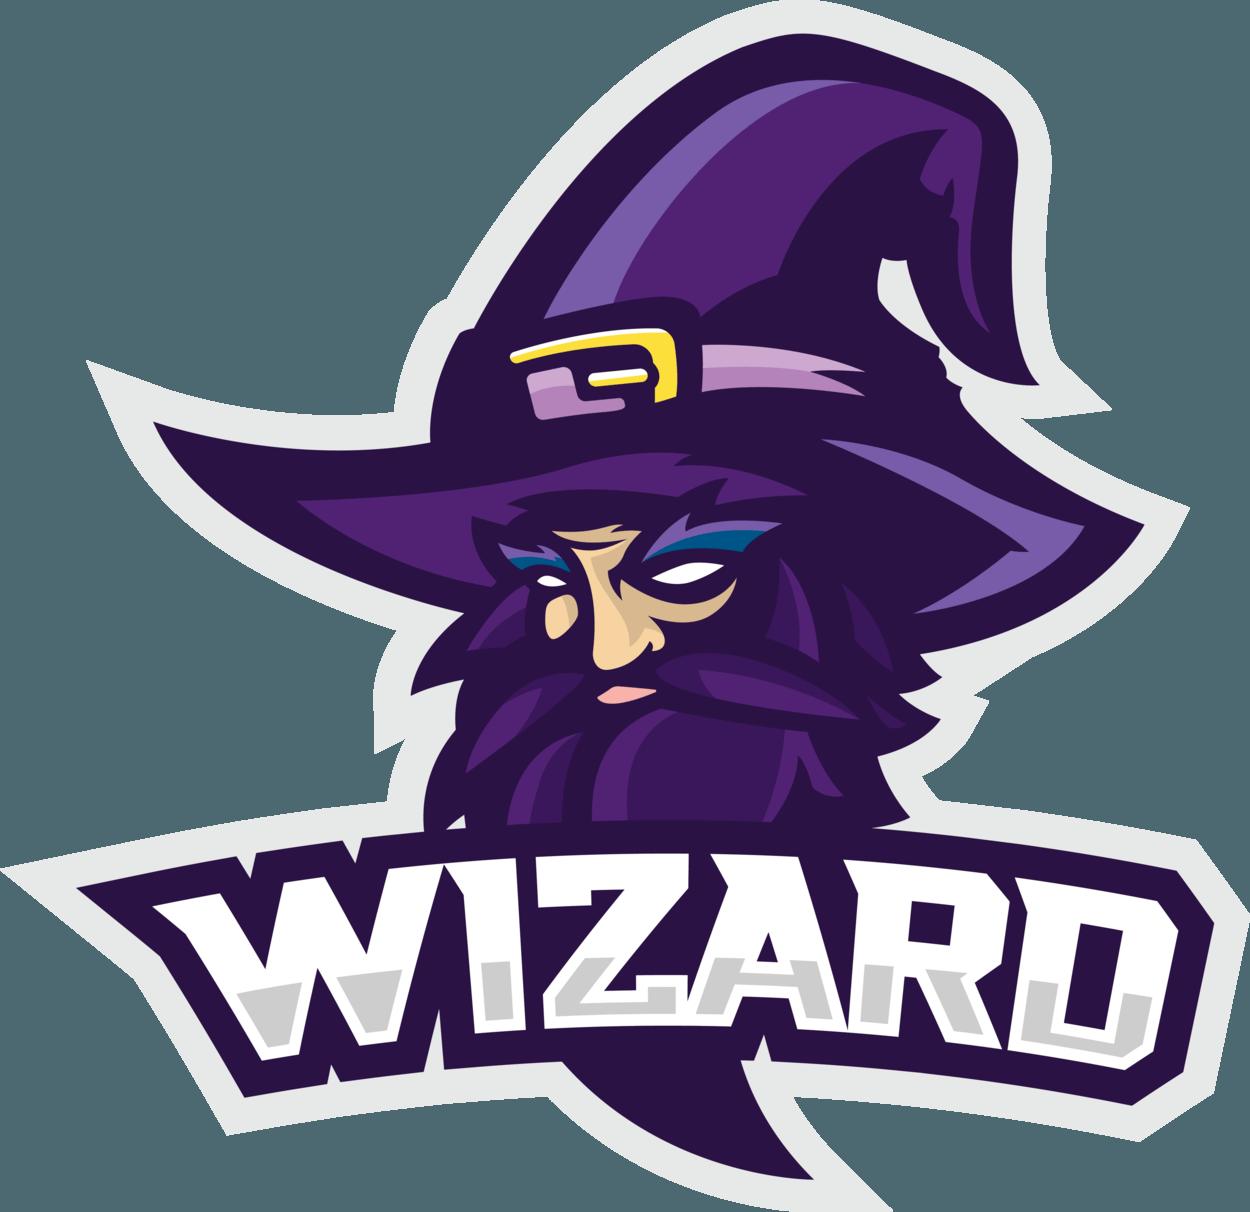 Image1487311688 Png 1250 1212 Wizards Logo Wizard Darth Vader